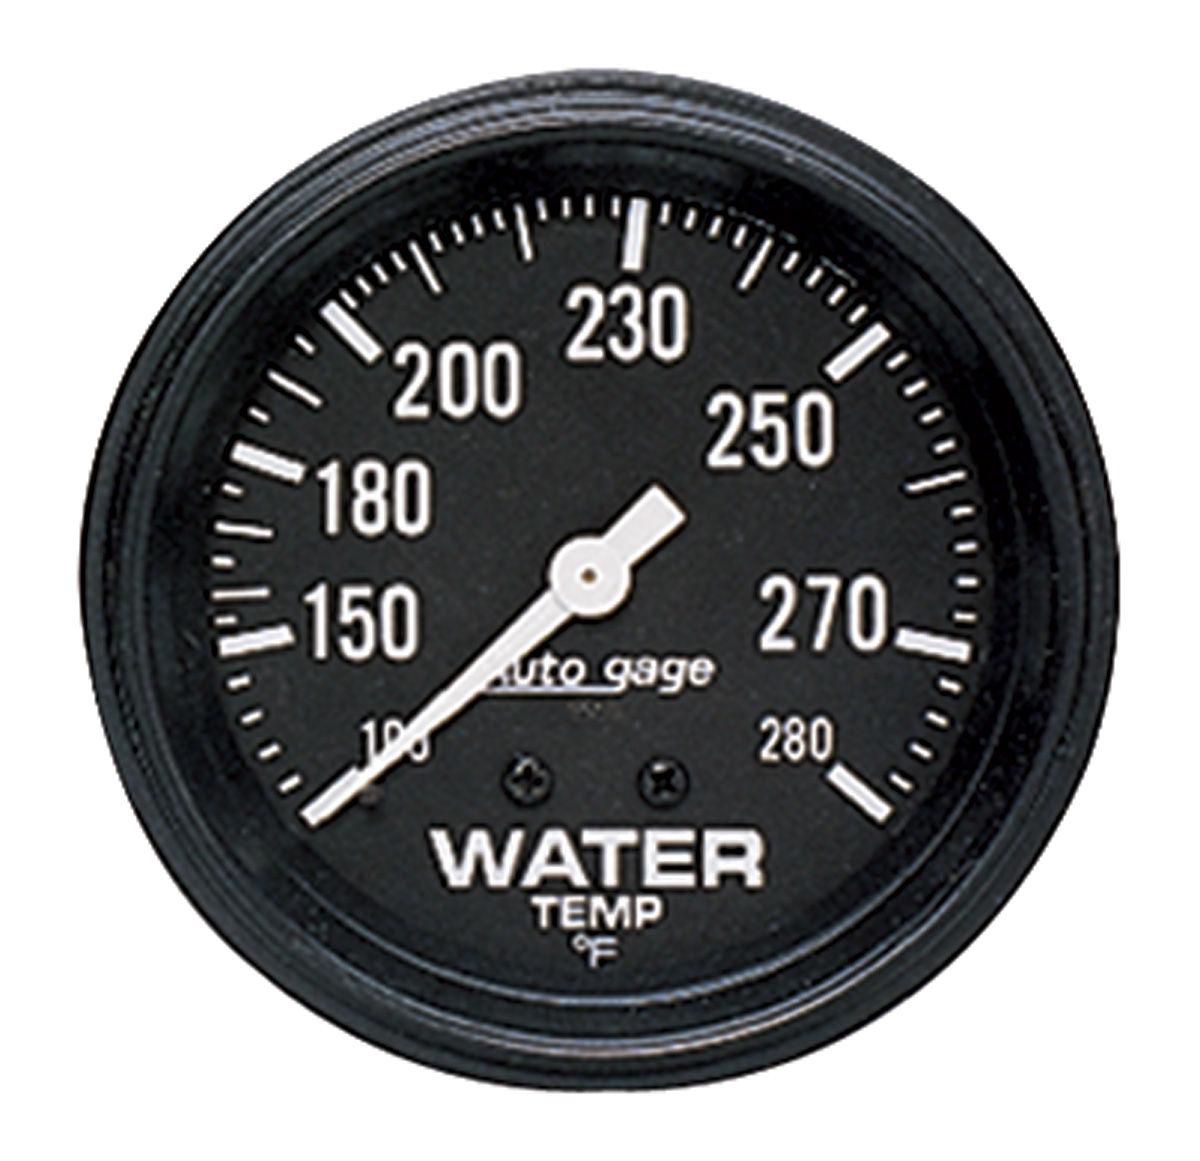 Gauge, Water Temperature, Auto Meter, Auto Gage, 2-5/8